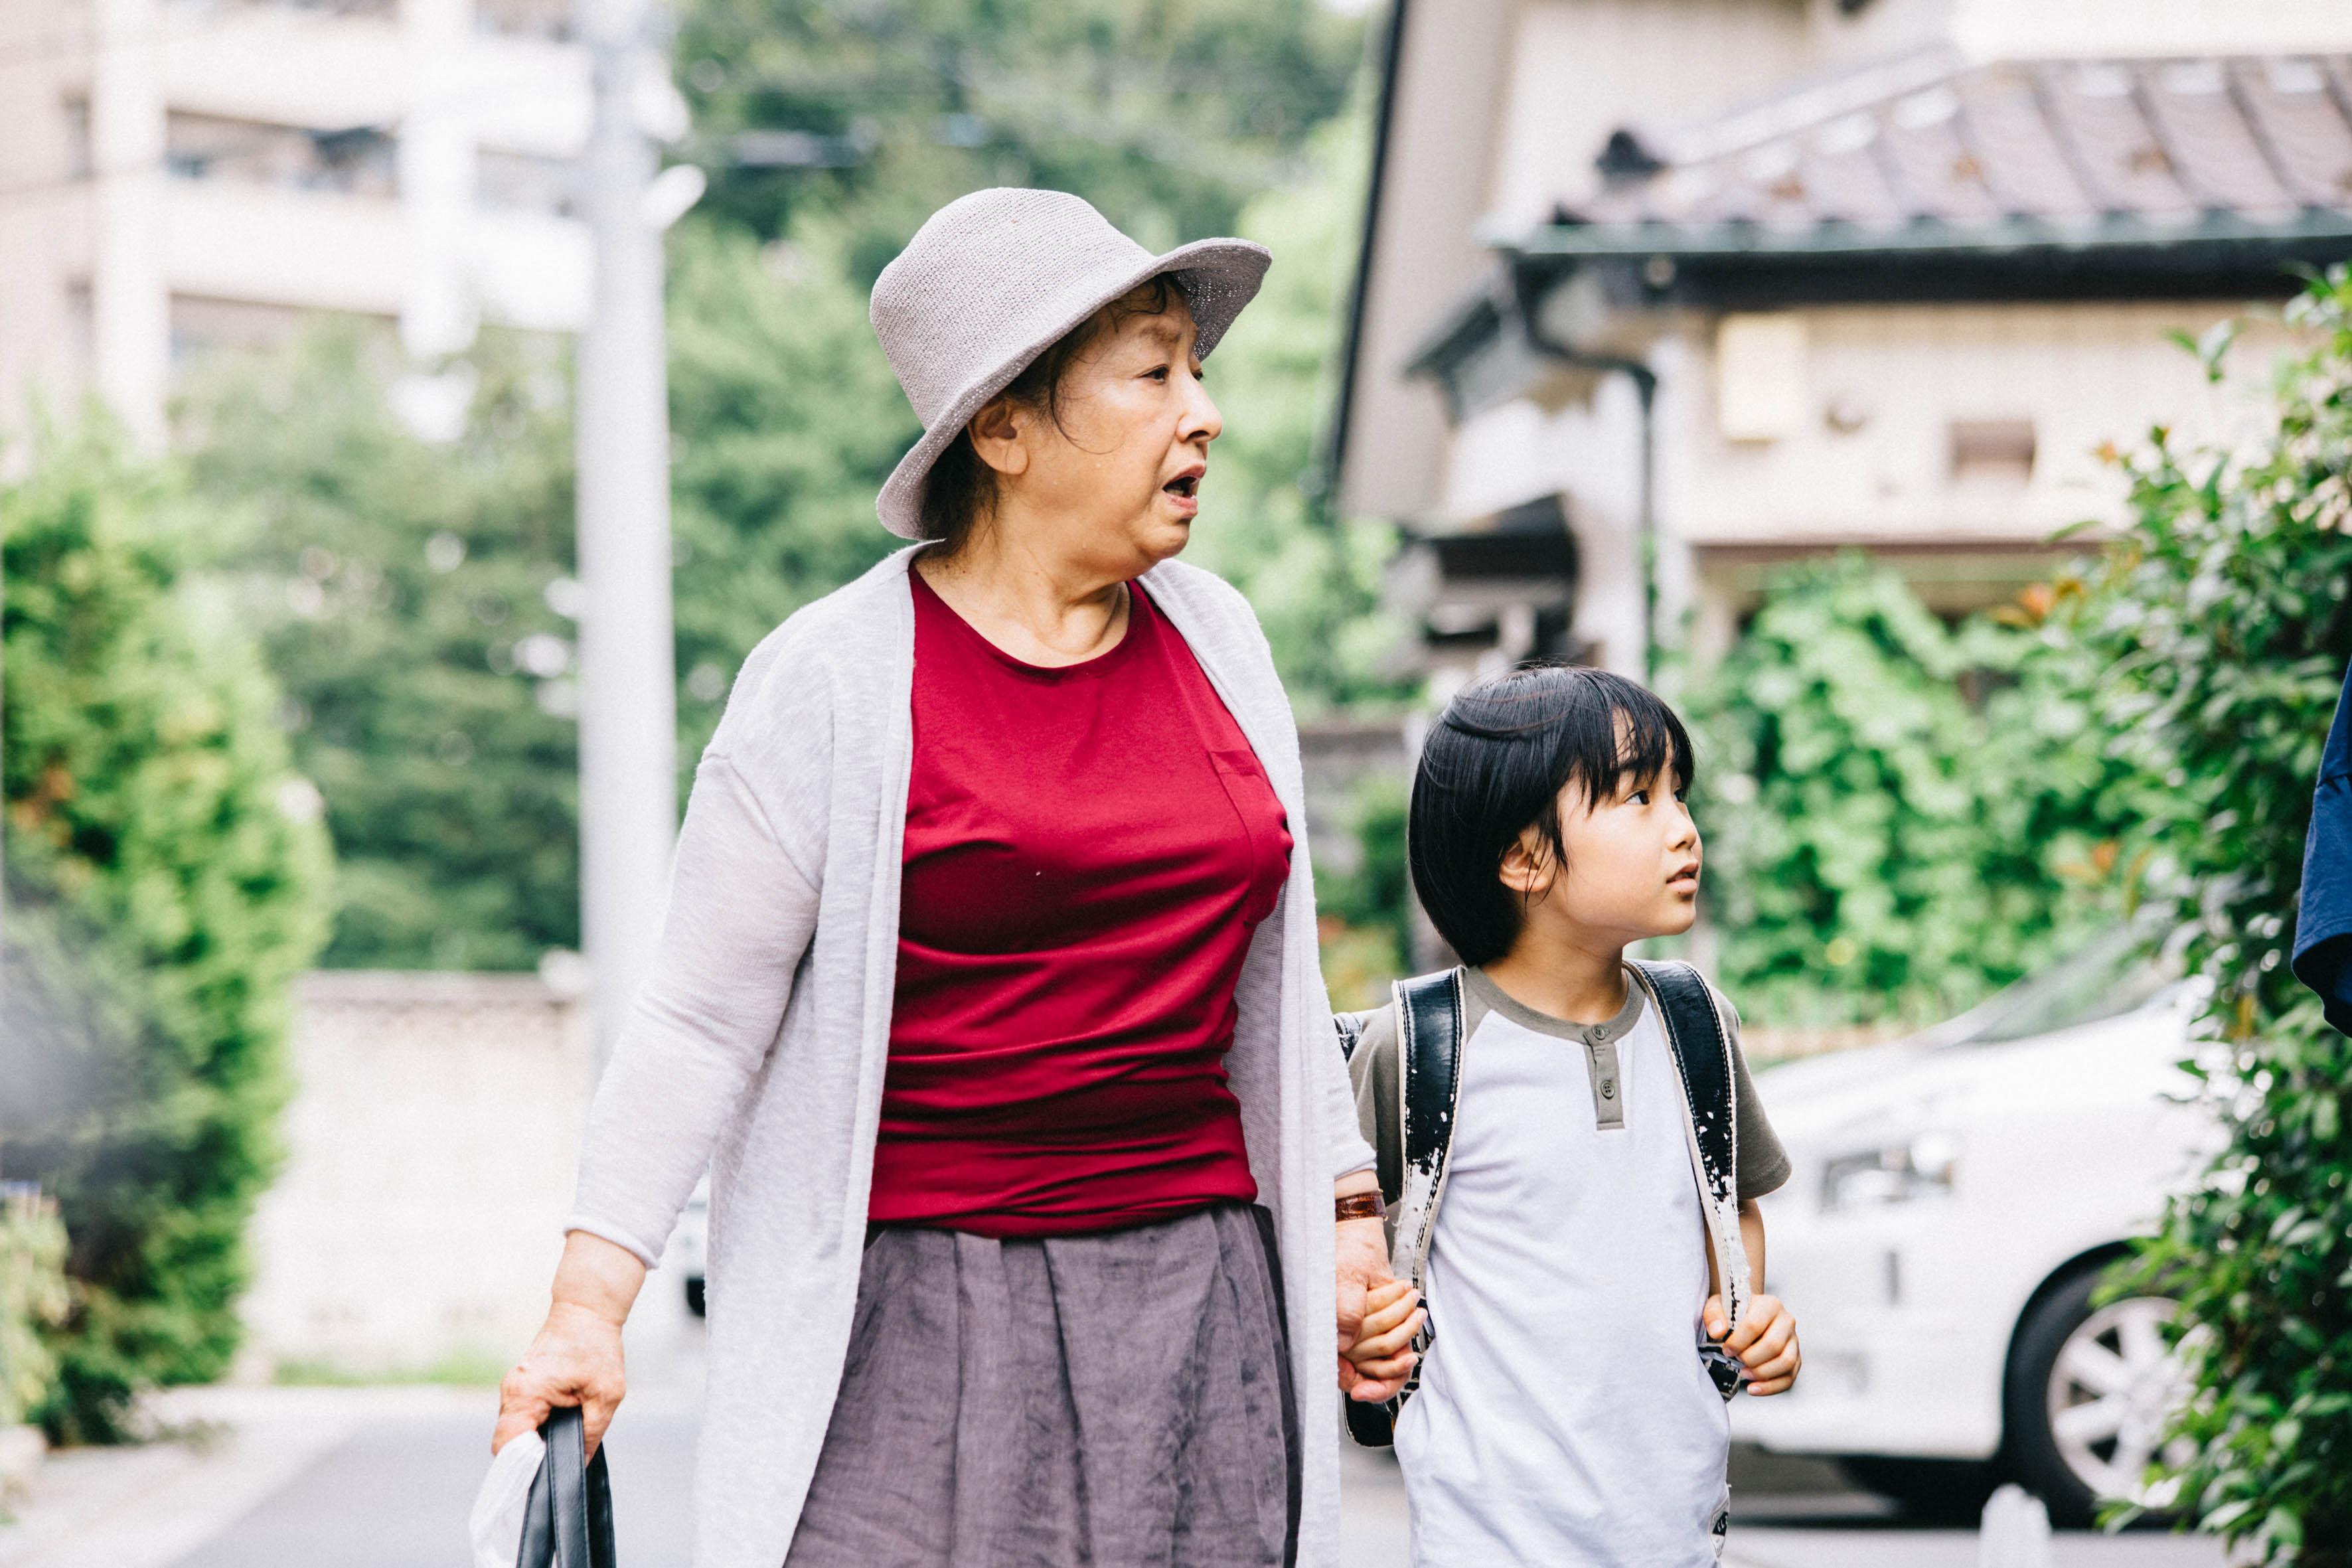 Topics tagged under 電影情報 on 紀由屋分享坊 Aaeuao20